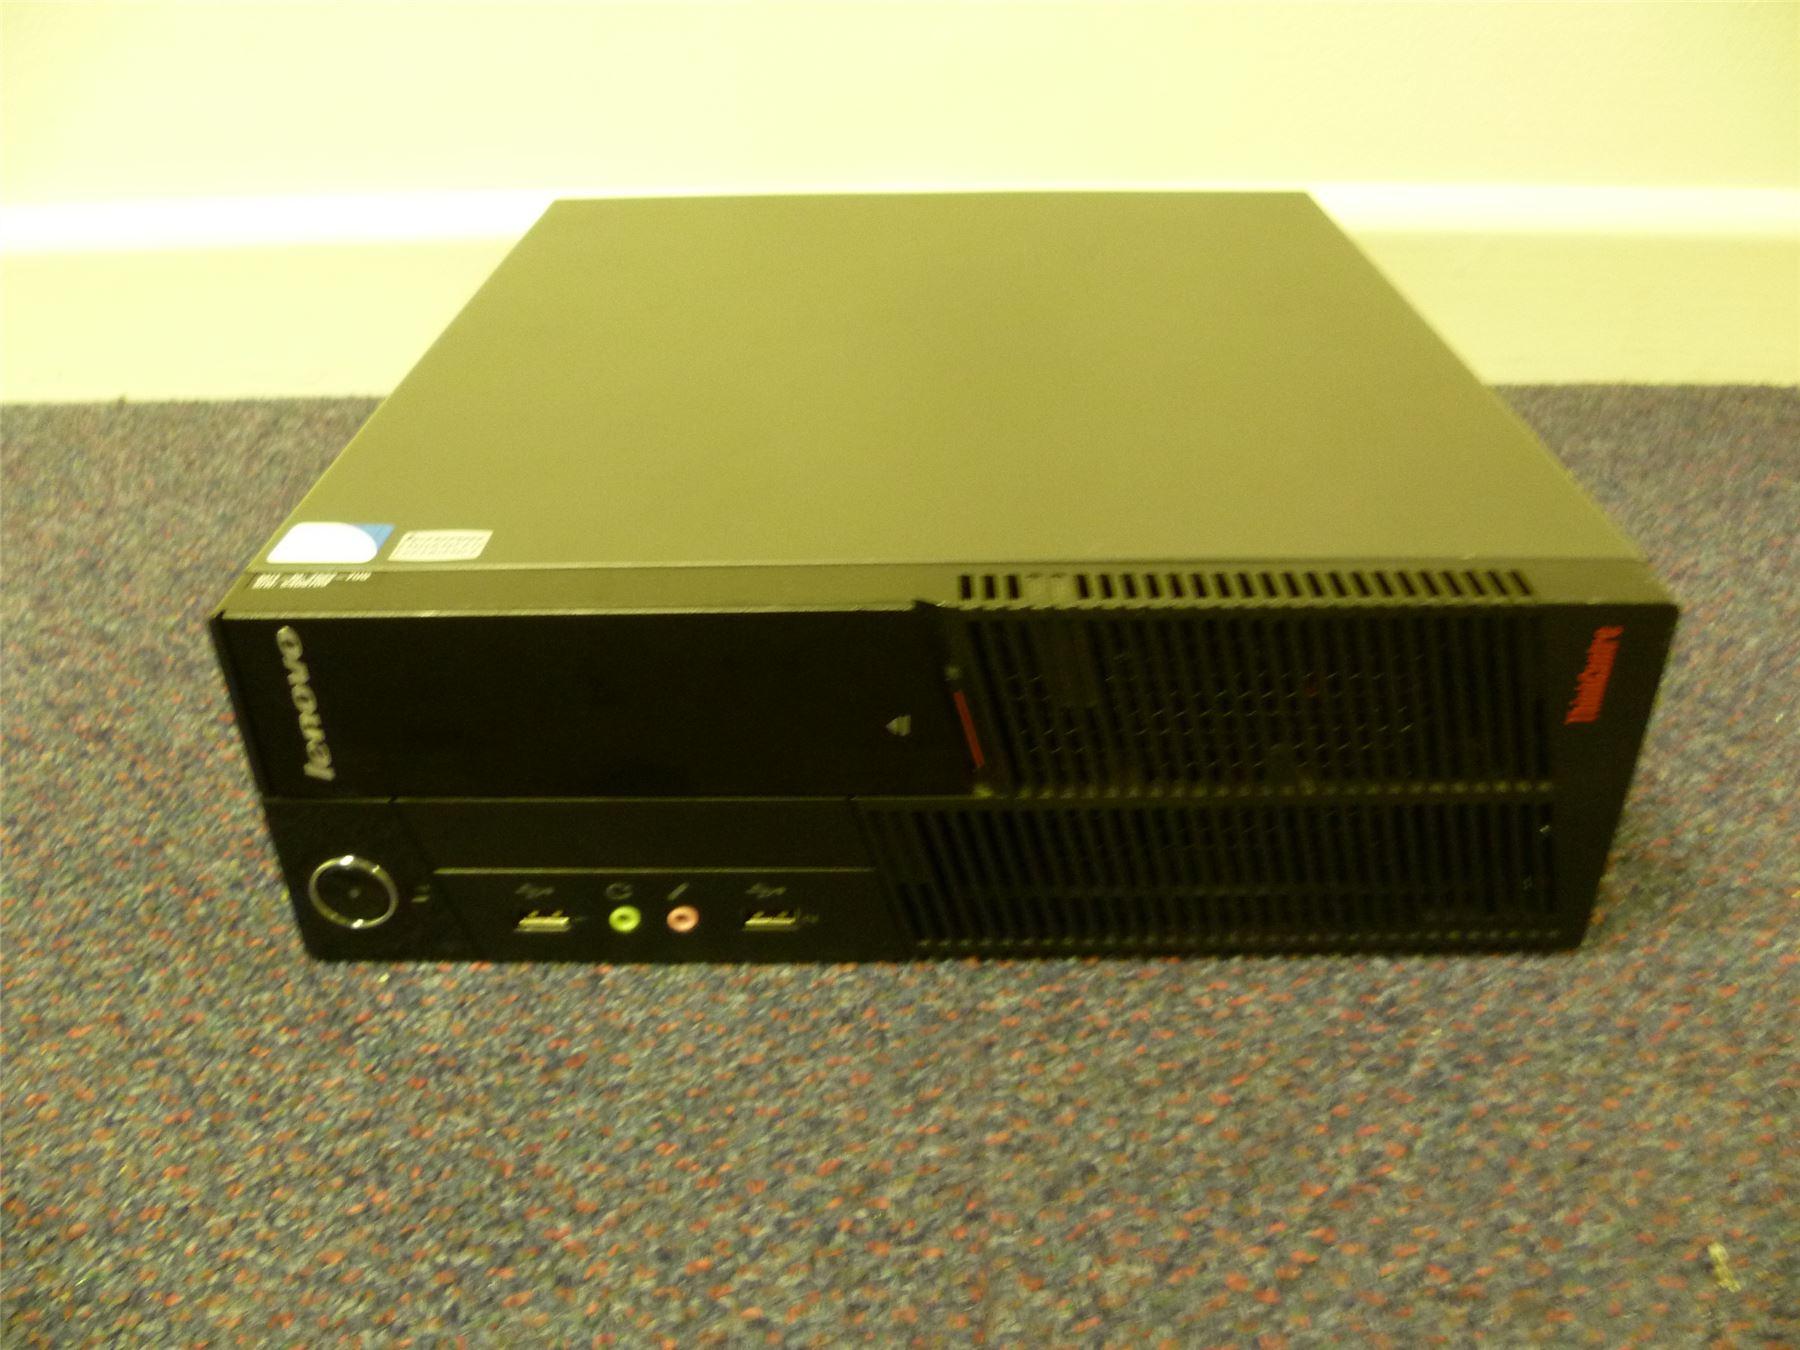 Lenovo-ThinkCentre-A58-Desktop-PC-Windows-7-Pro-2-7GHz-Dual-Core-4GB-320GB